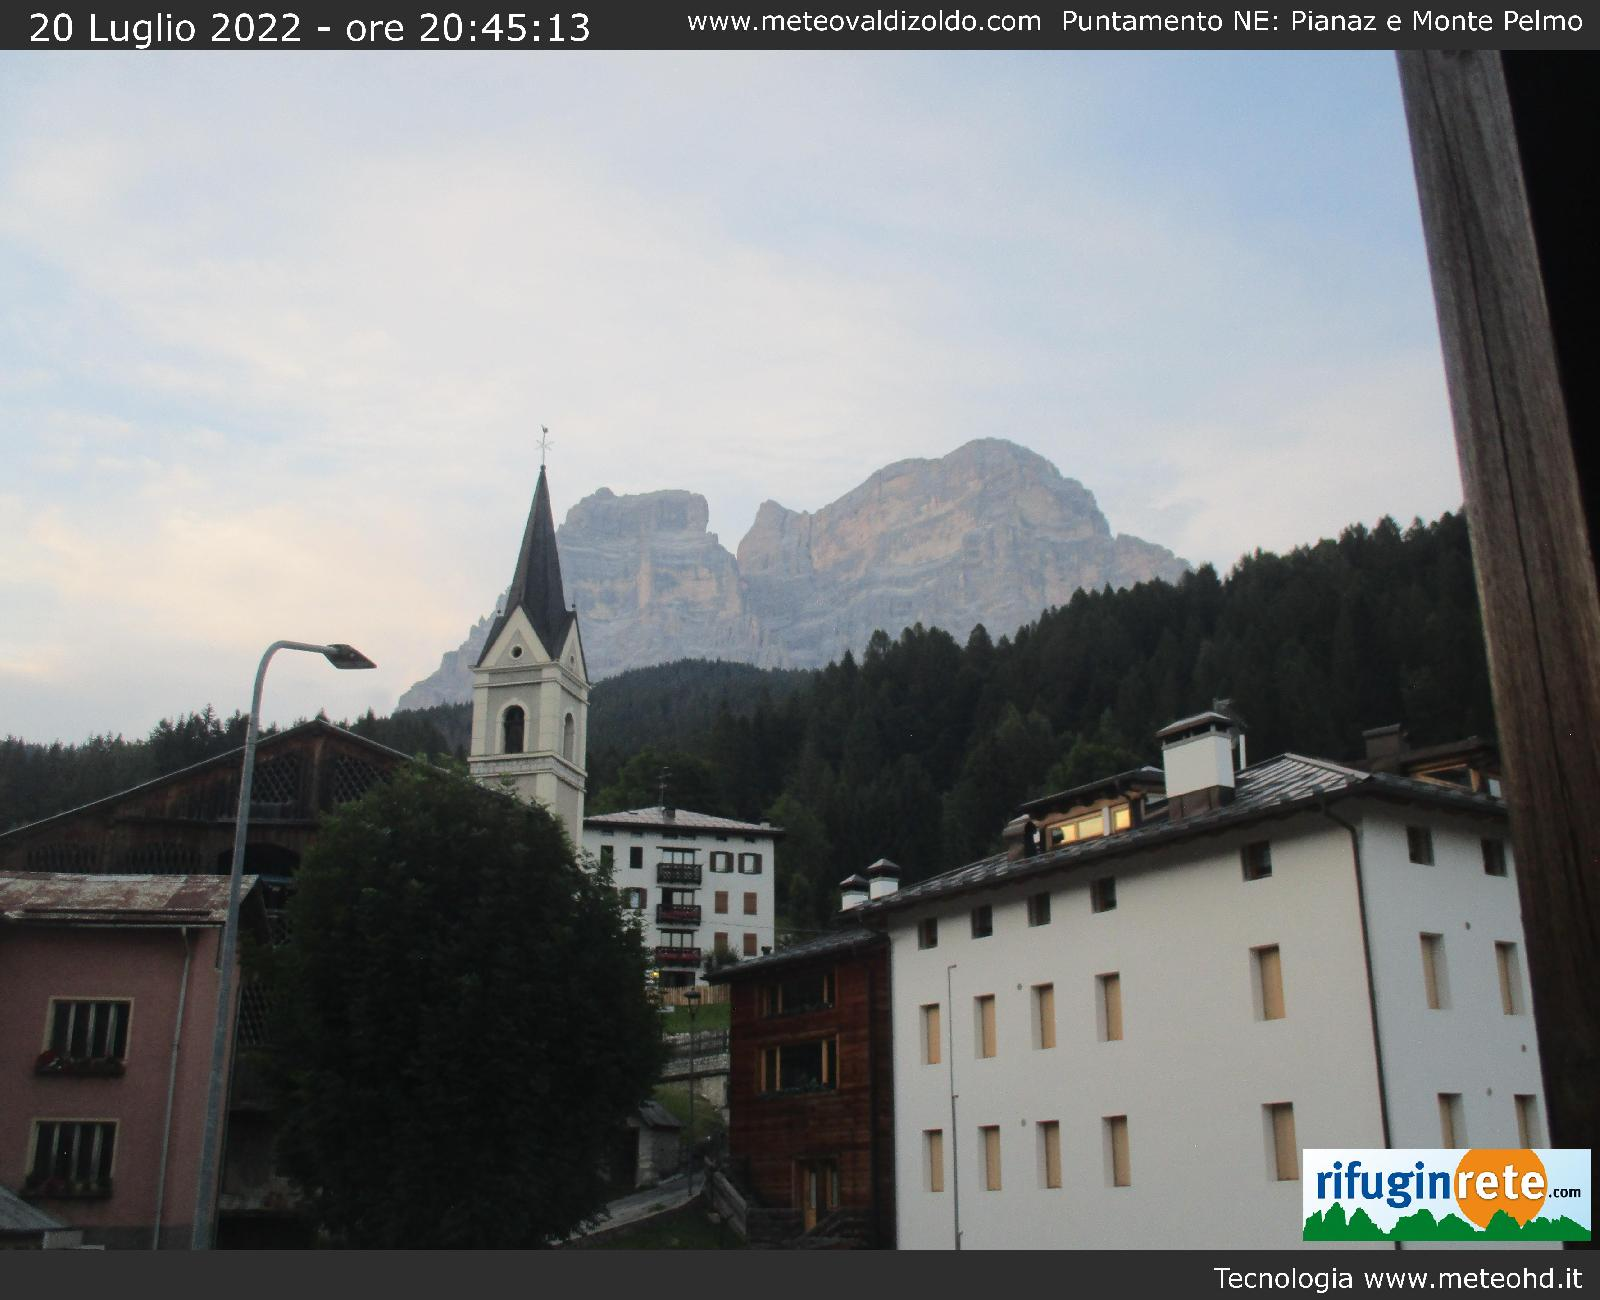 webcam zoldo alto pianaz palma campetto scuola skilift